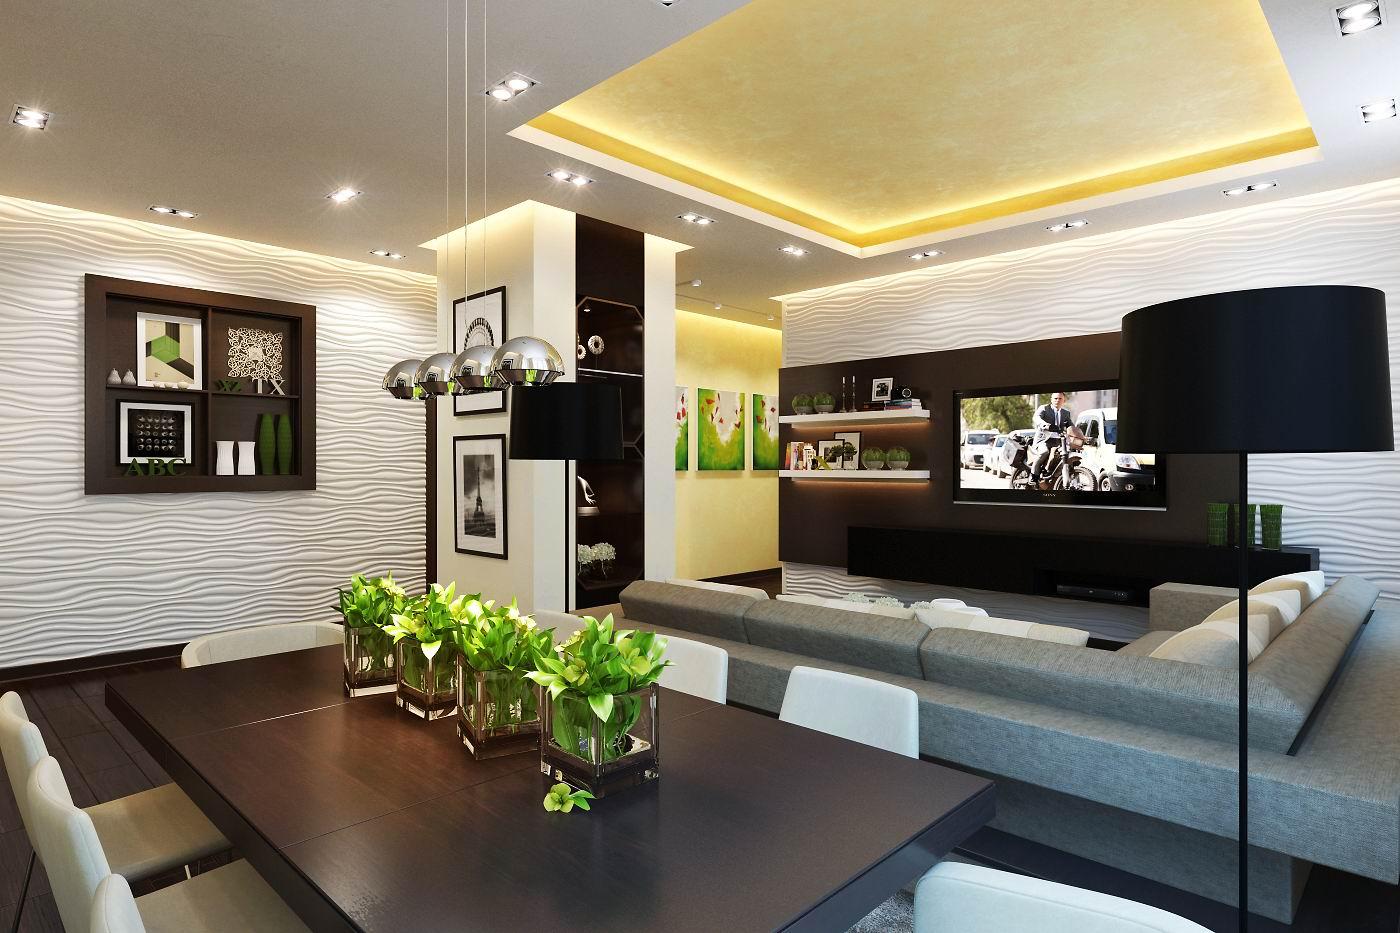 Дизайн гостиной-кухни в стиле модерн фото